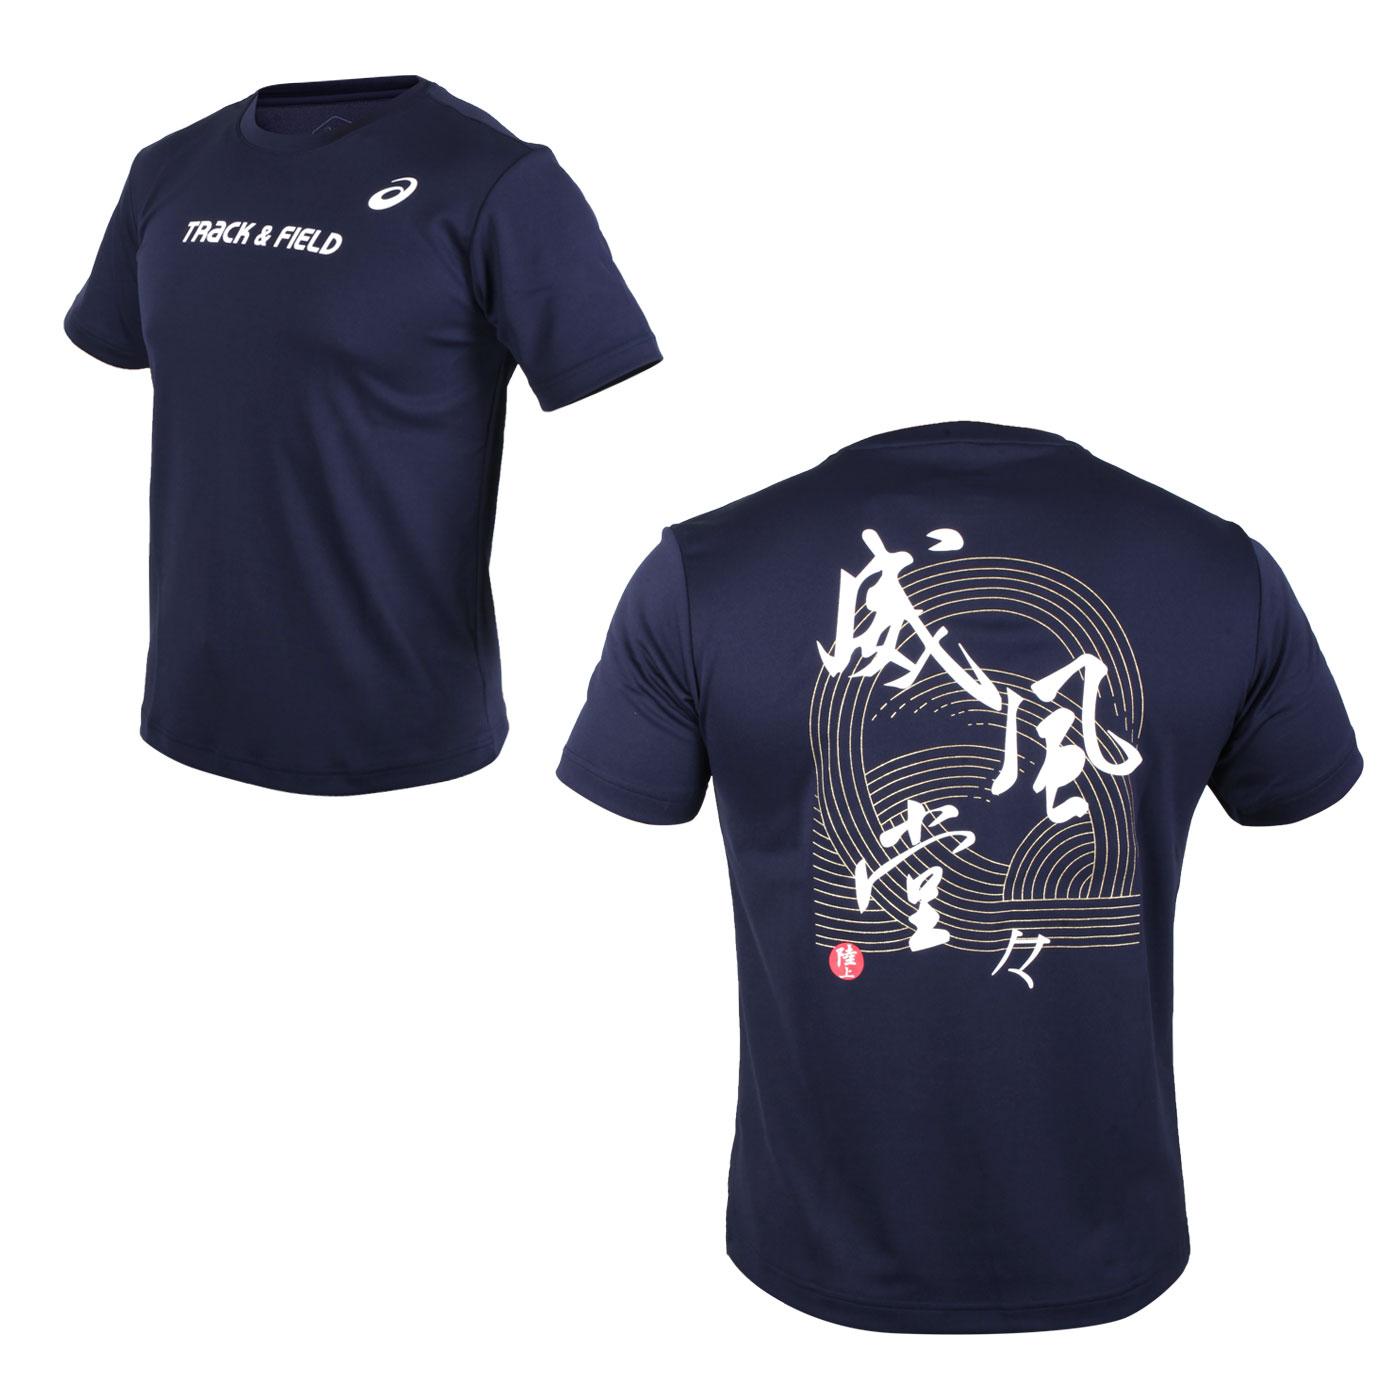 ASICS 男款短袖T恤 2093A129-401